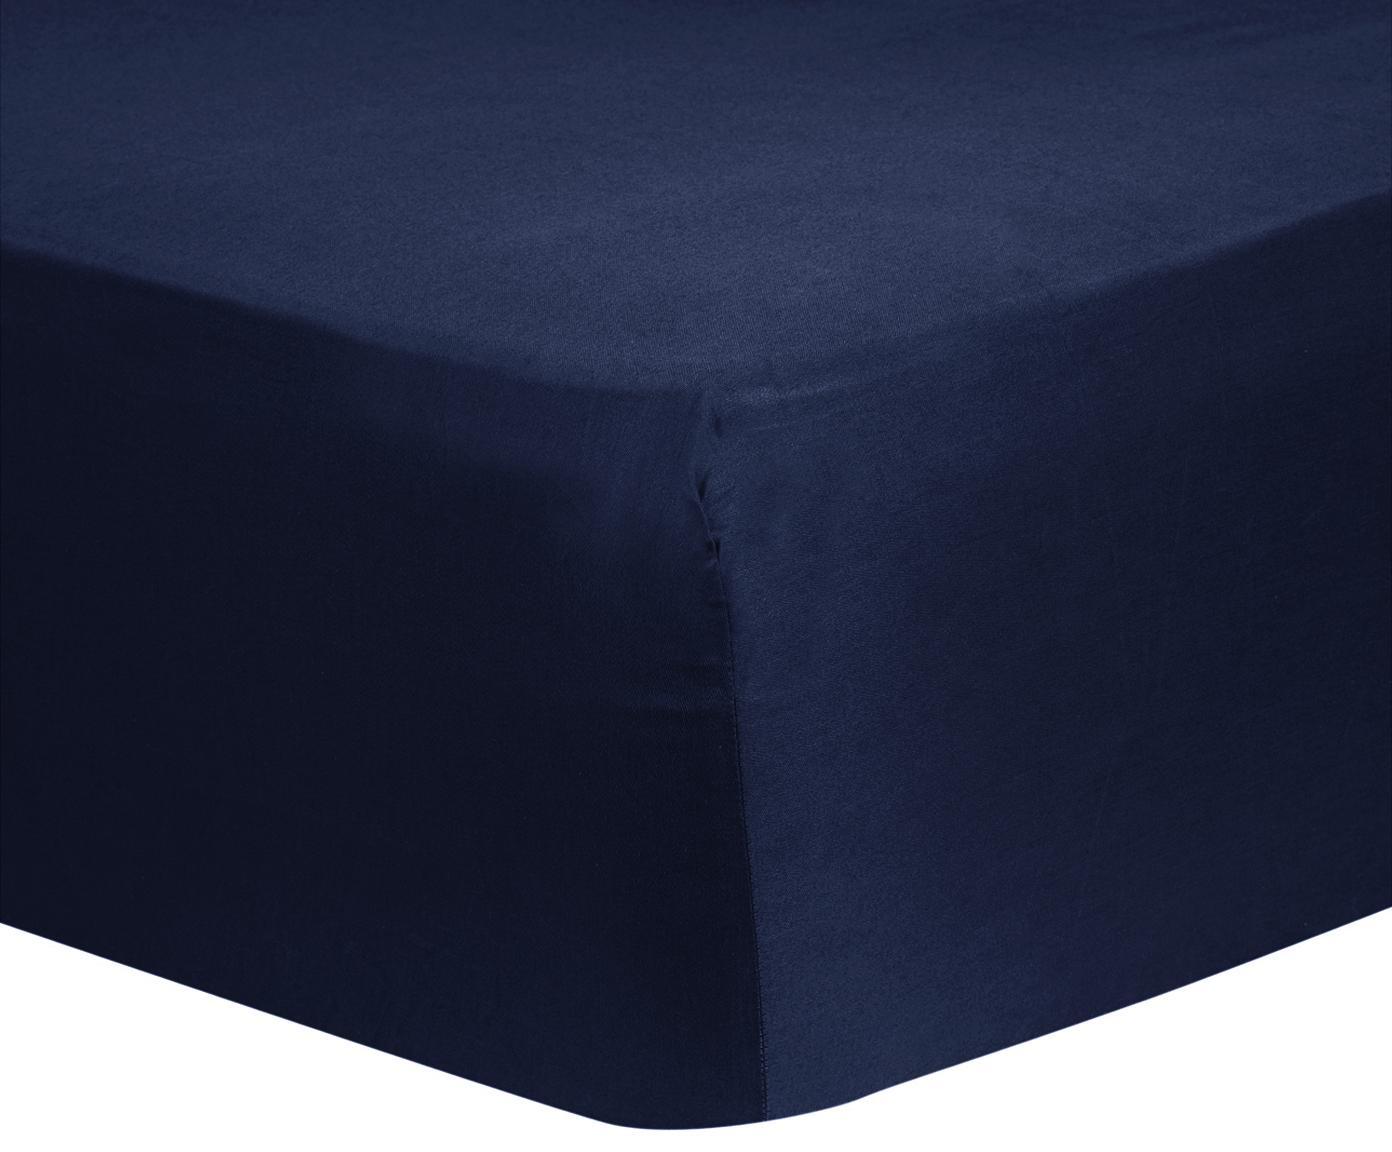 Sábana bajera para boxspring de algodón Comfort, Azul oscuro, Cama 90 cm (90 x 200 cm)